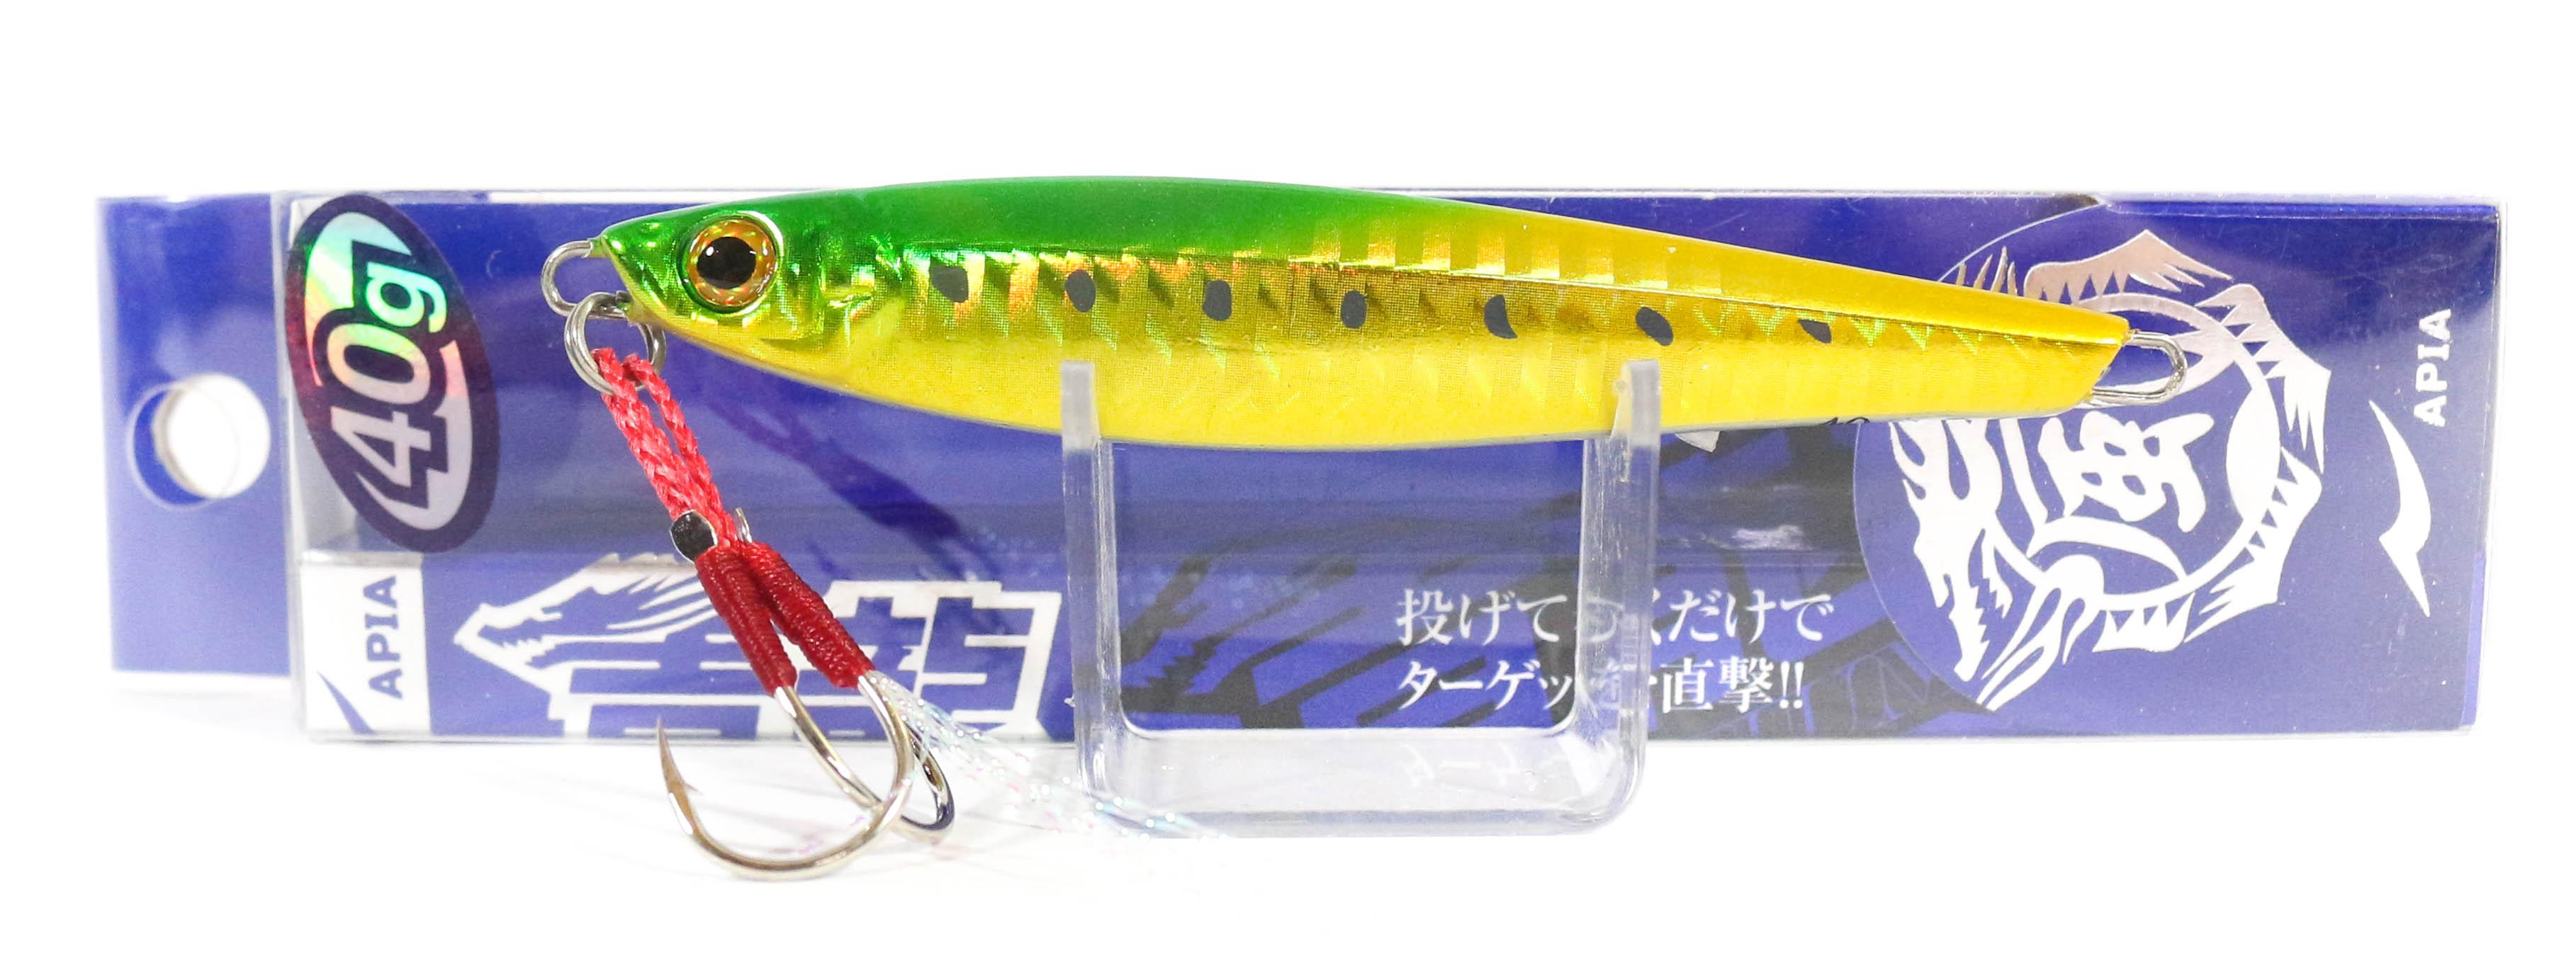 Sale Apia Metal Jig Seiryu Premium 40 grams 48 (8634)